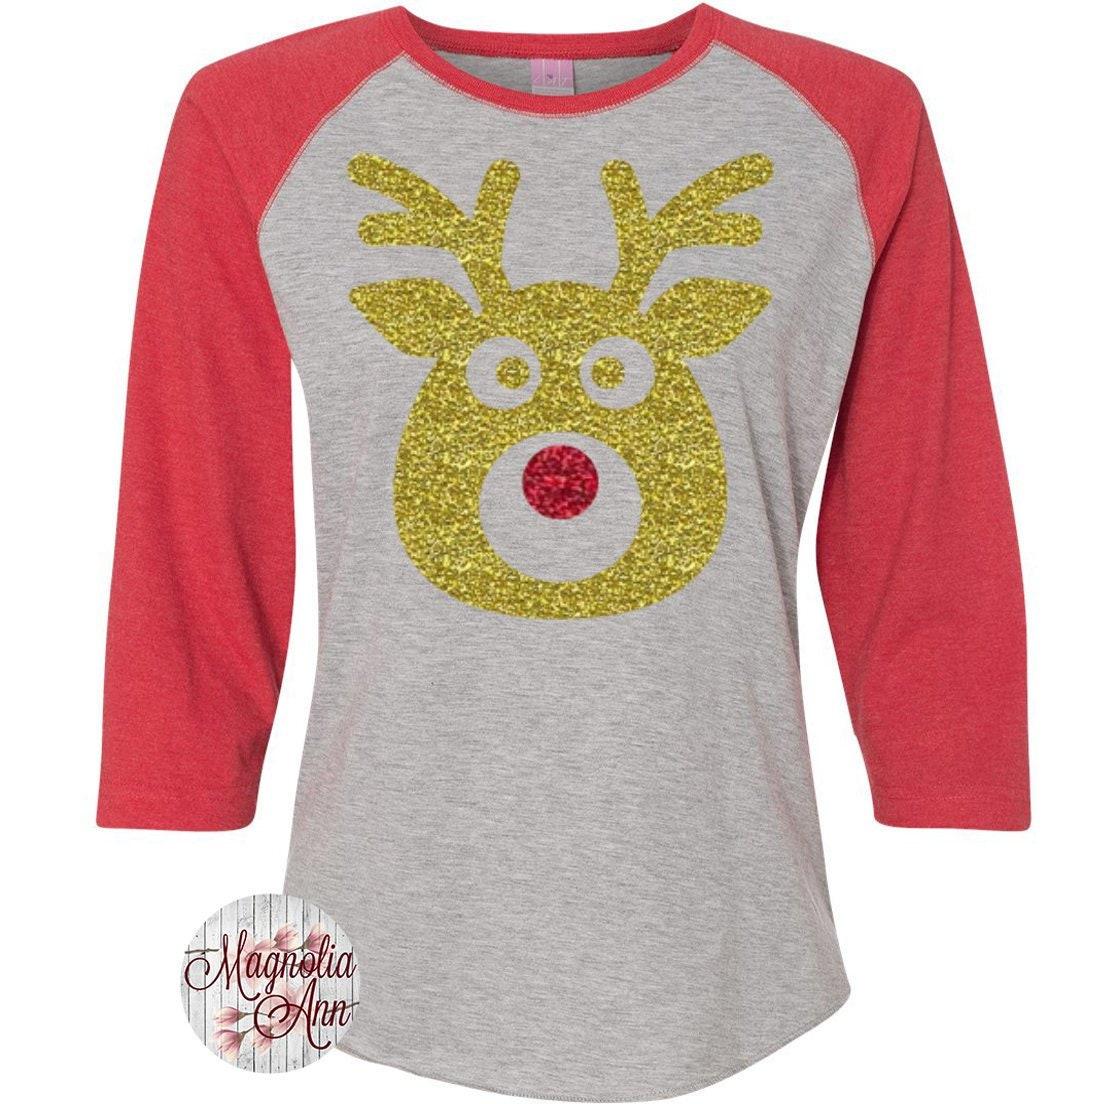 0aa6f8c44 Family Reindeer Shirts Christmas Shirt Matching Christmas | Etsy